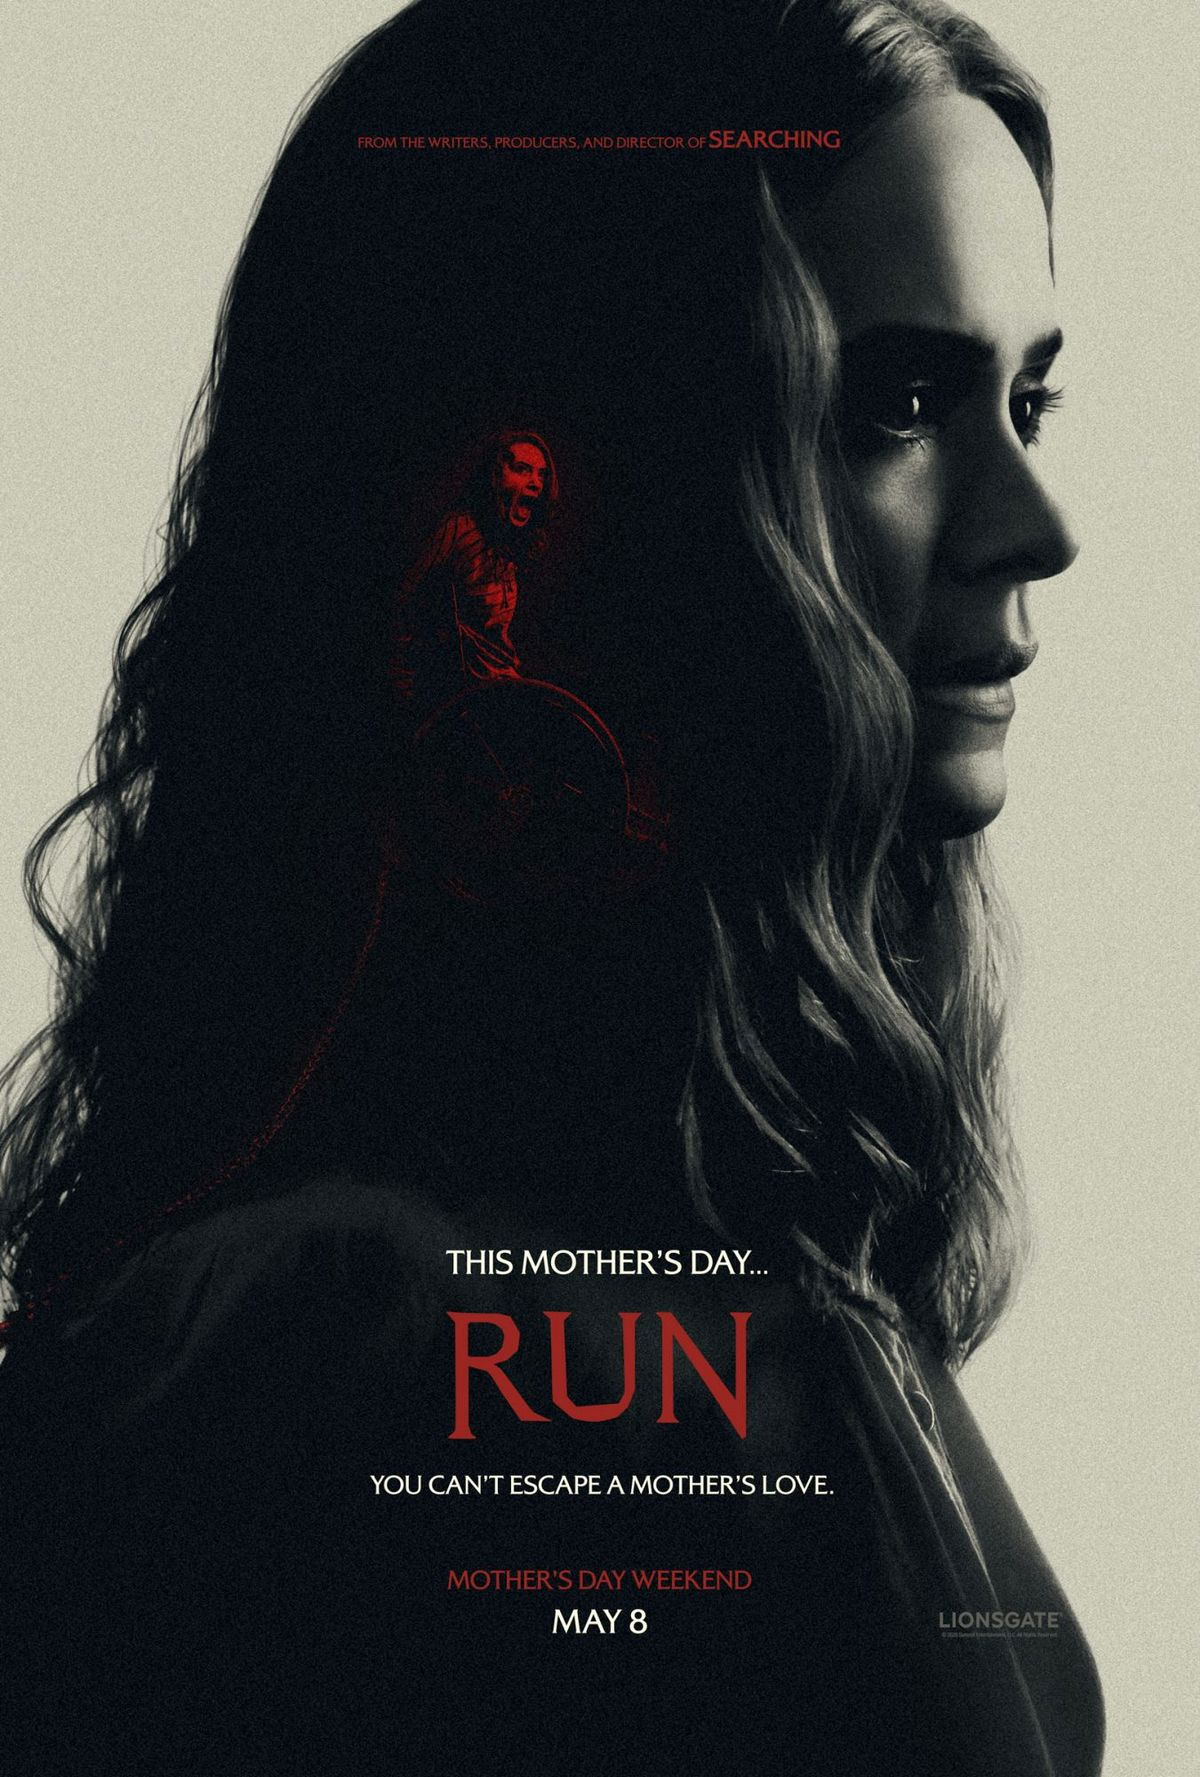 Run؛ فیلمی که دستکم یکبار باید تماشایش کرد/ سارا پولسون و رازهای دلهرهآورش